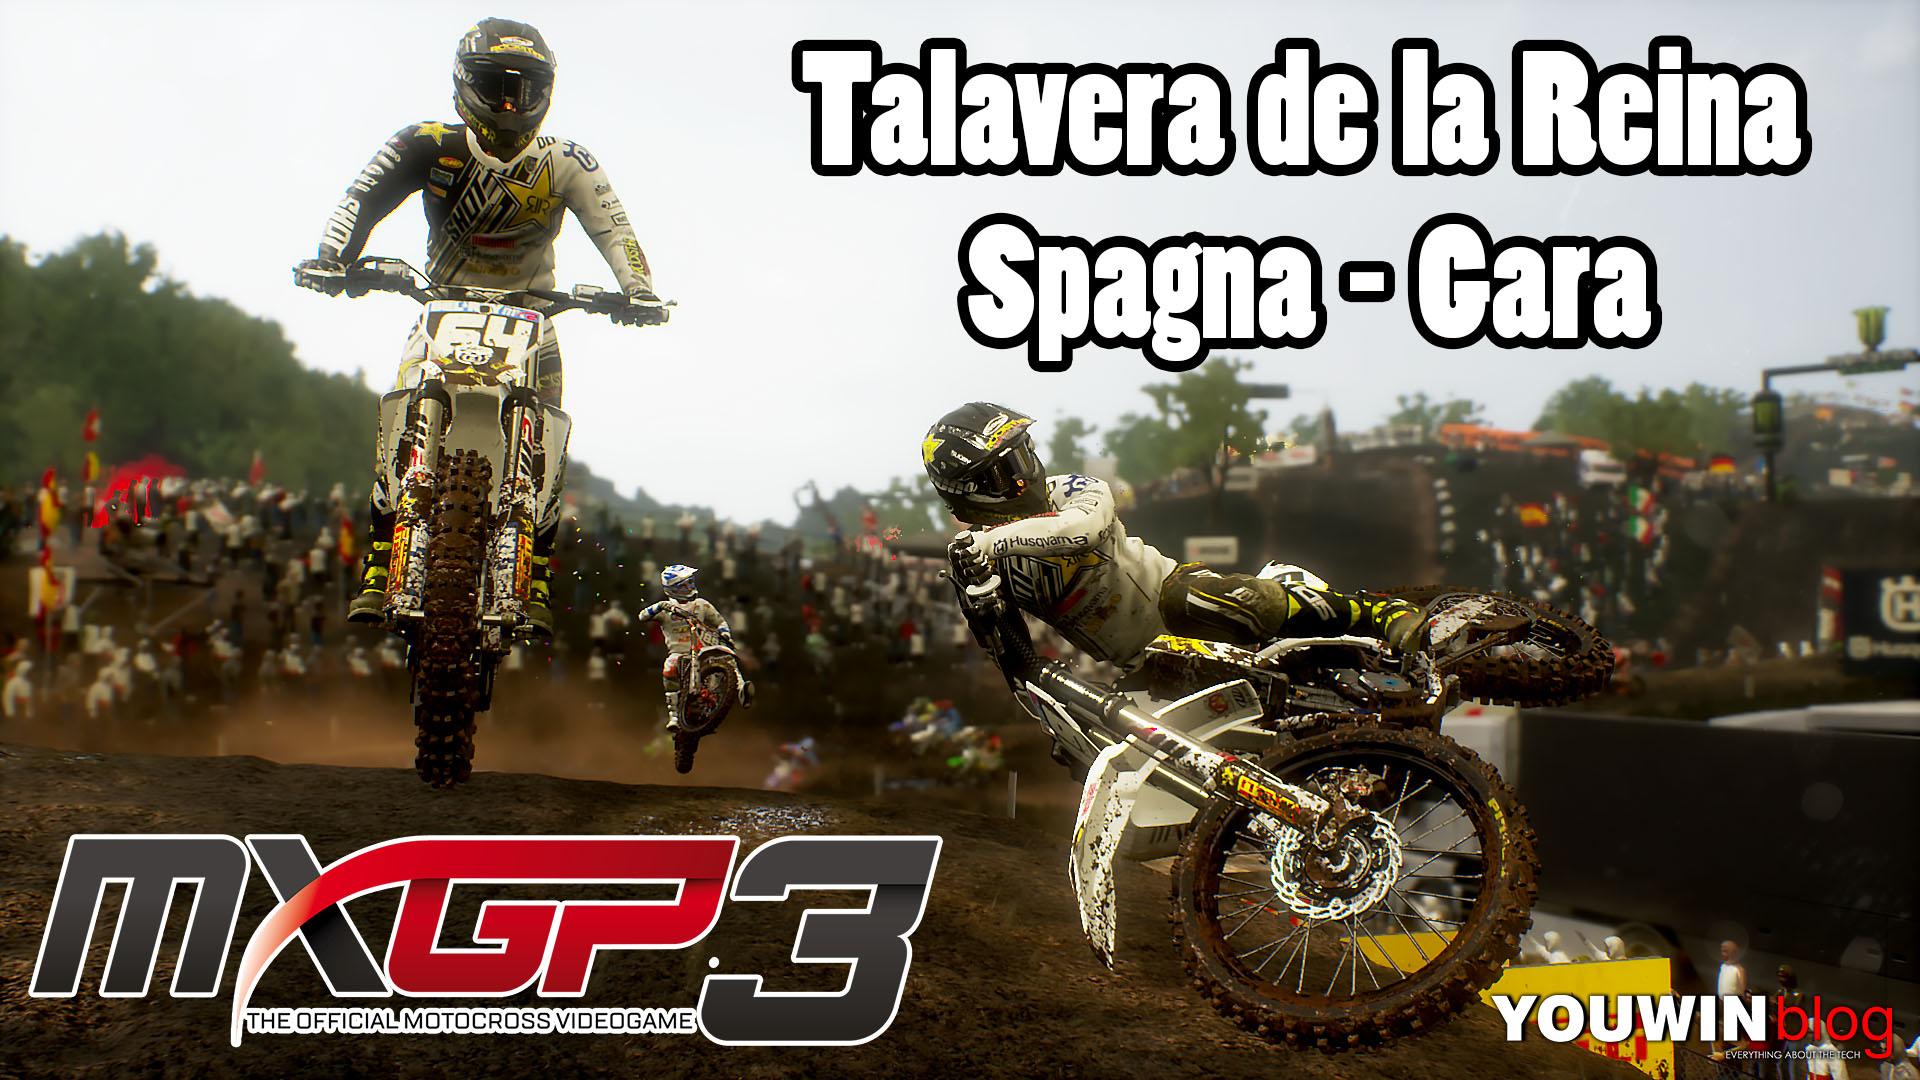 MXGP3 Gara @ Circuito Cerro Negro